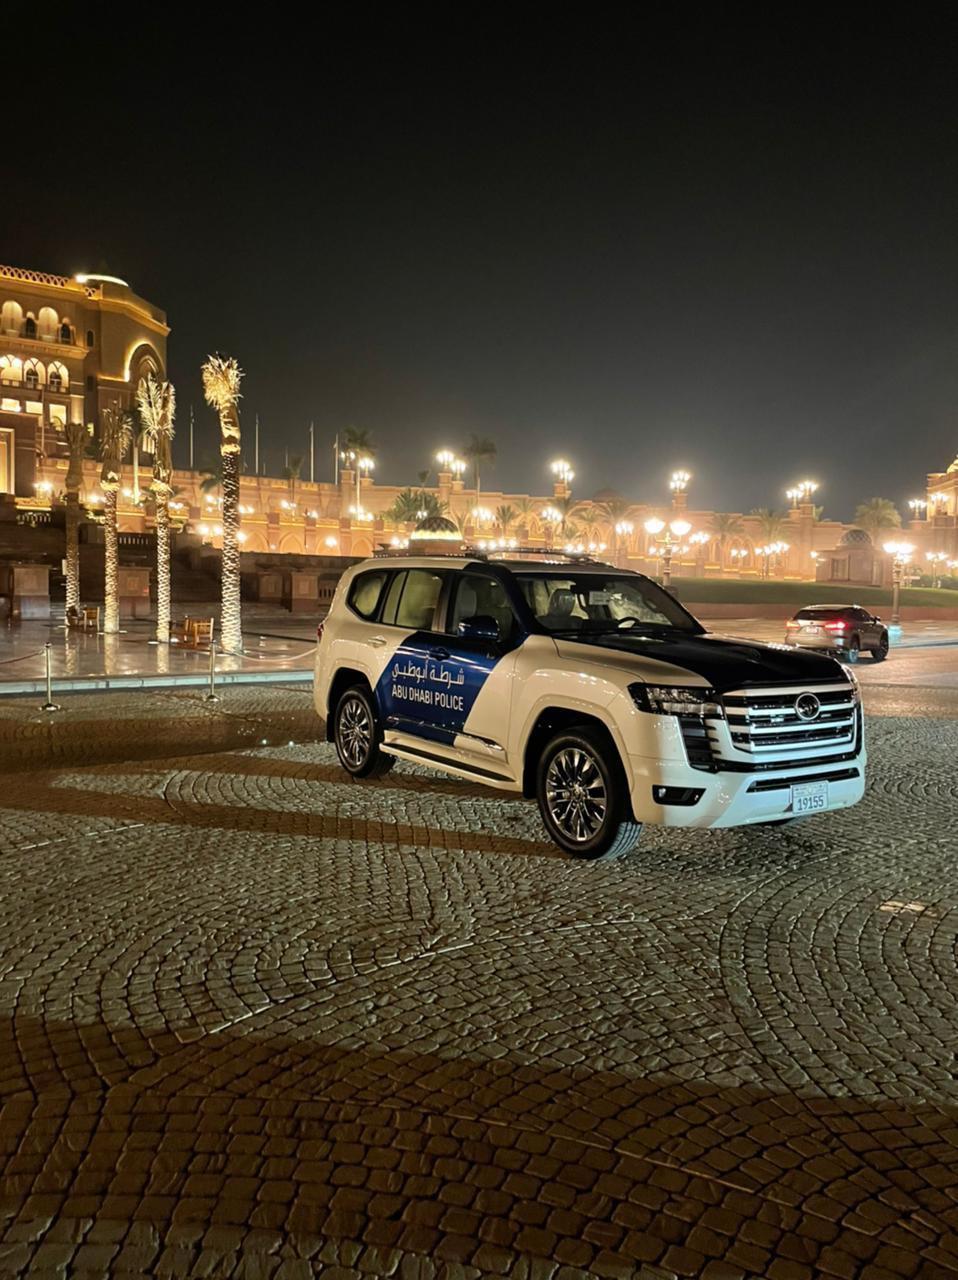 Dubai_Abu-Dhabi_police_Land_Cruiser-0004